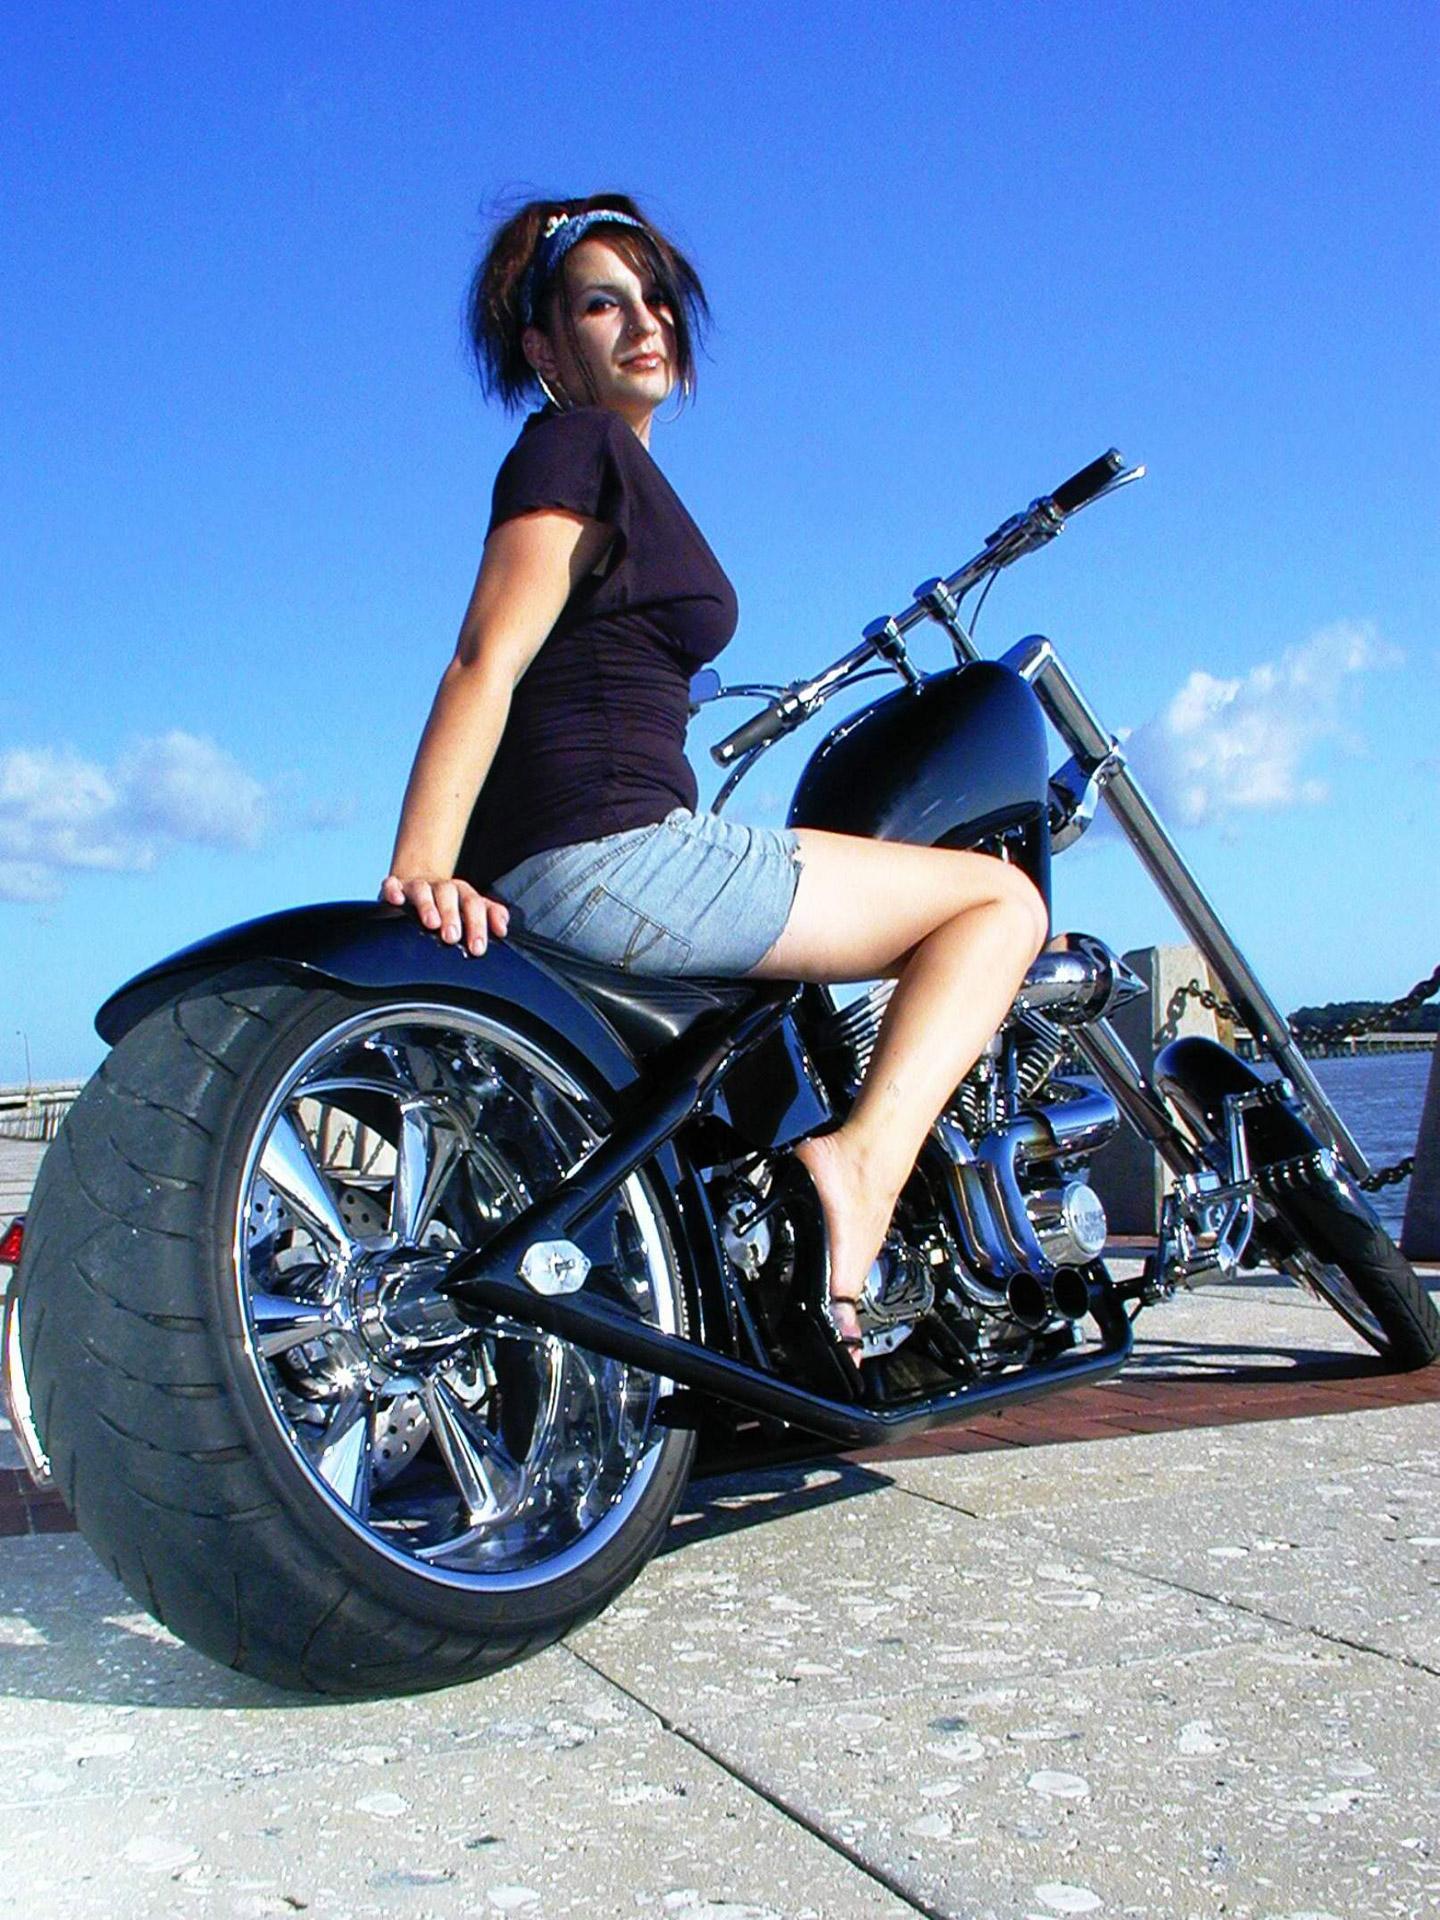 Motorcycle, Bike, Motorcycle Safety Awareness Month